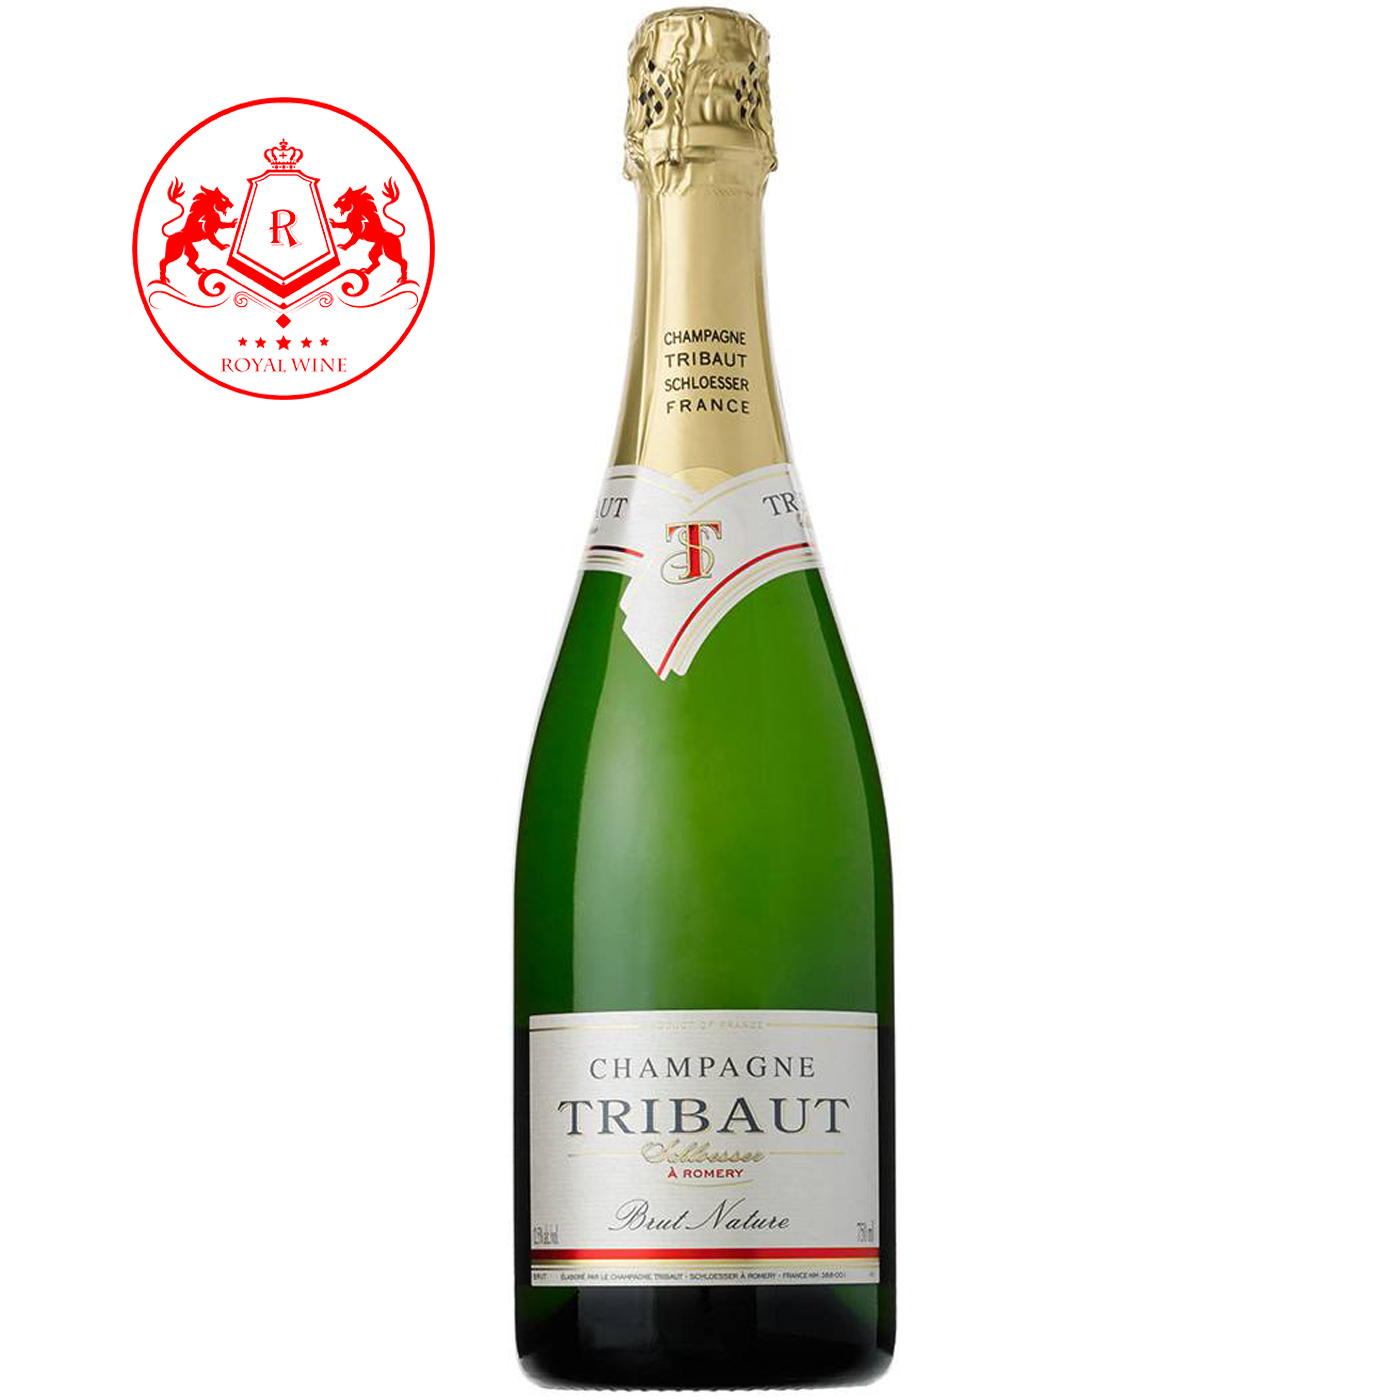 Champagne TRIBAUT SCHLOESSER Brut Nature